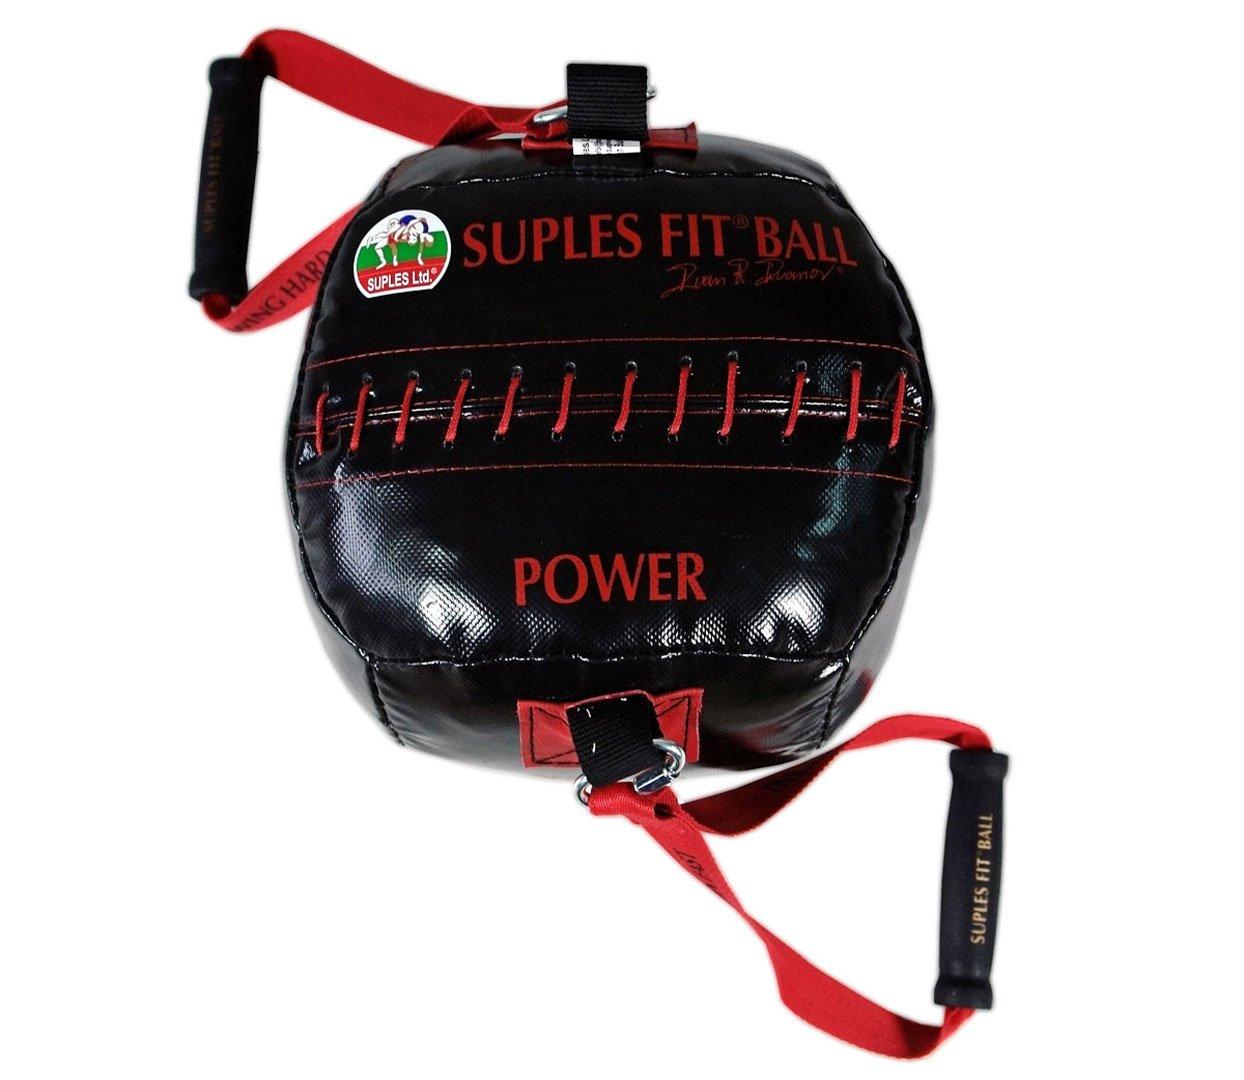 Suples Ball - 22lbs (POWER) (Fitness, Crossfit, Wrestling, Judo, Grappling, Functional Training, MMA, Sandbag, Core, Medicine Ball)